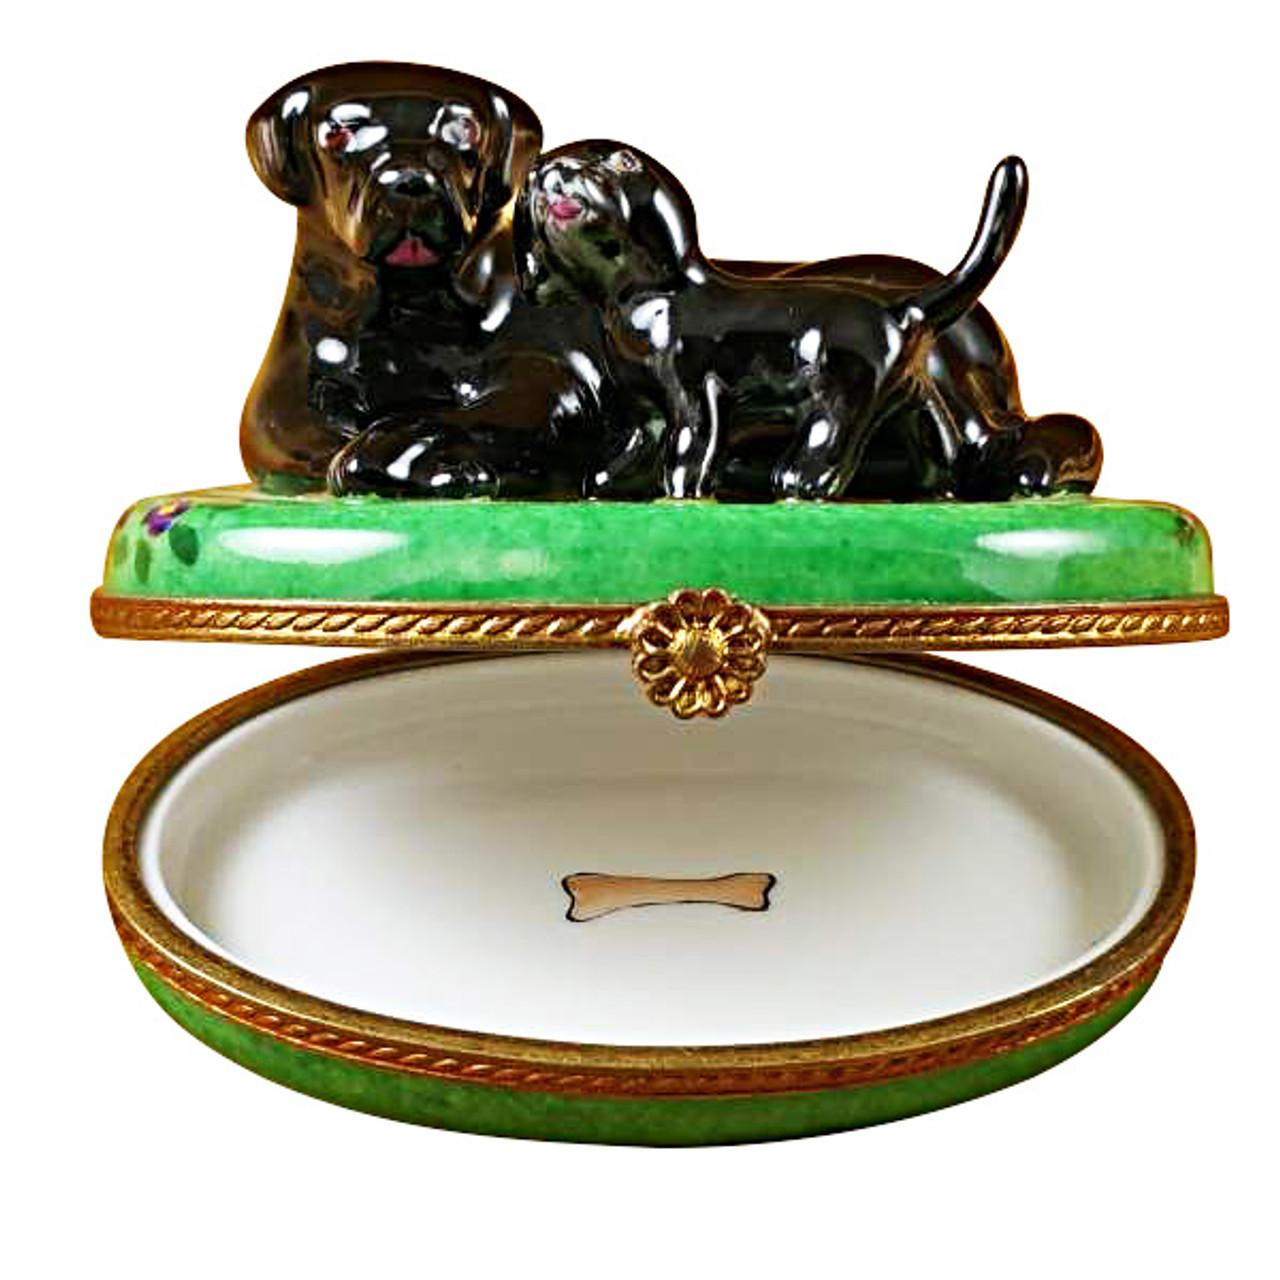 Limoges Imports Black Lab & Puppy Limoges Box